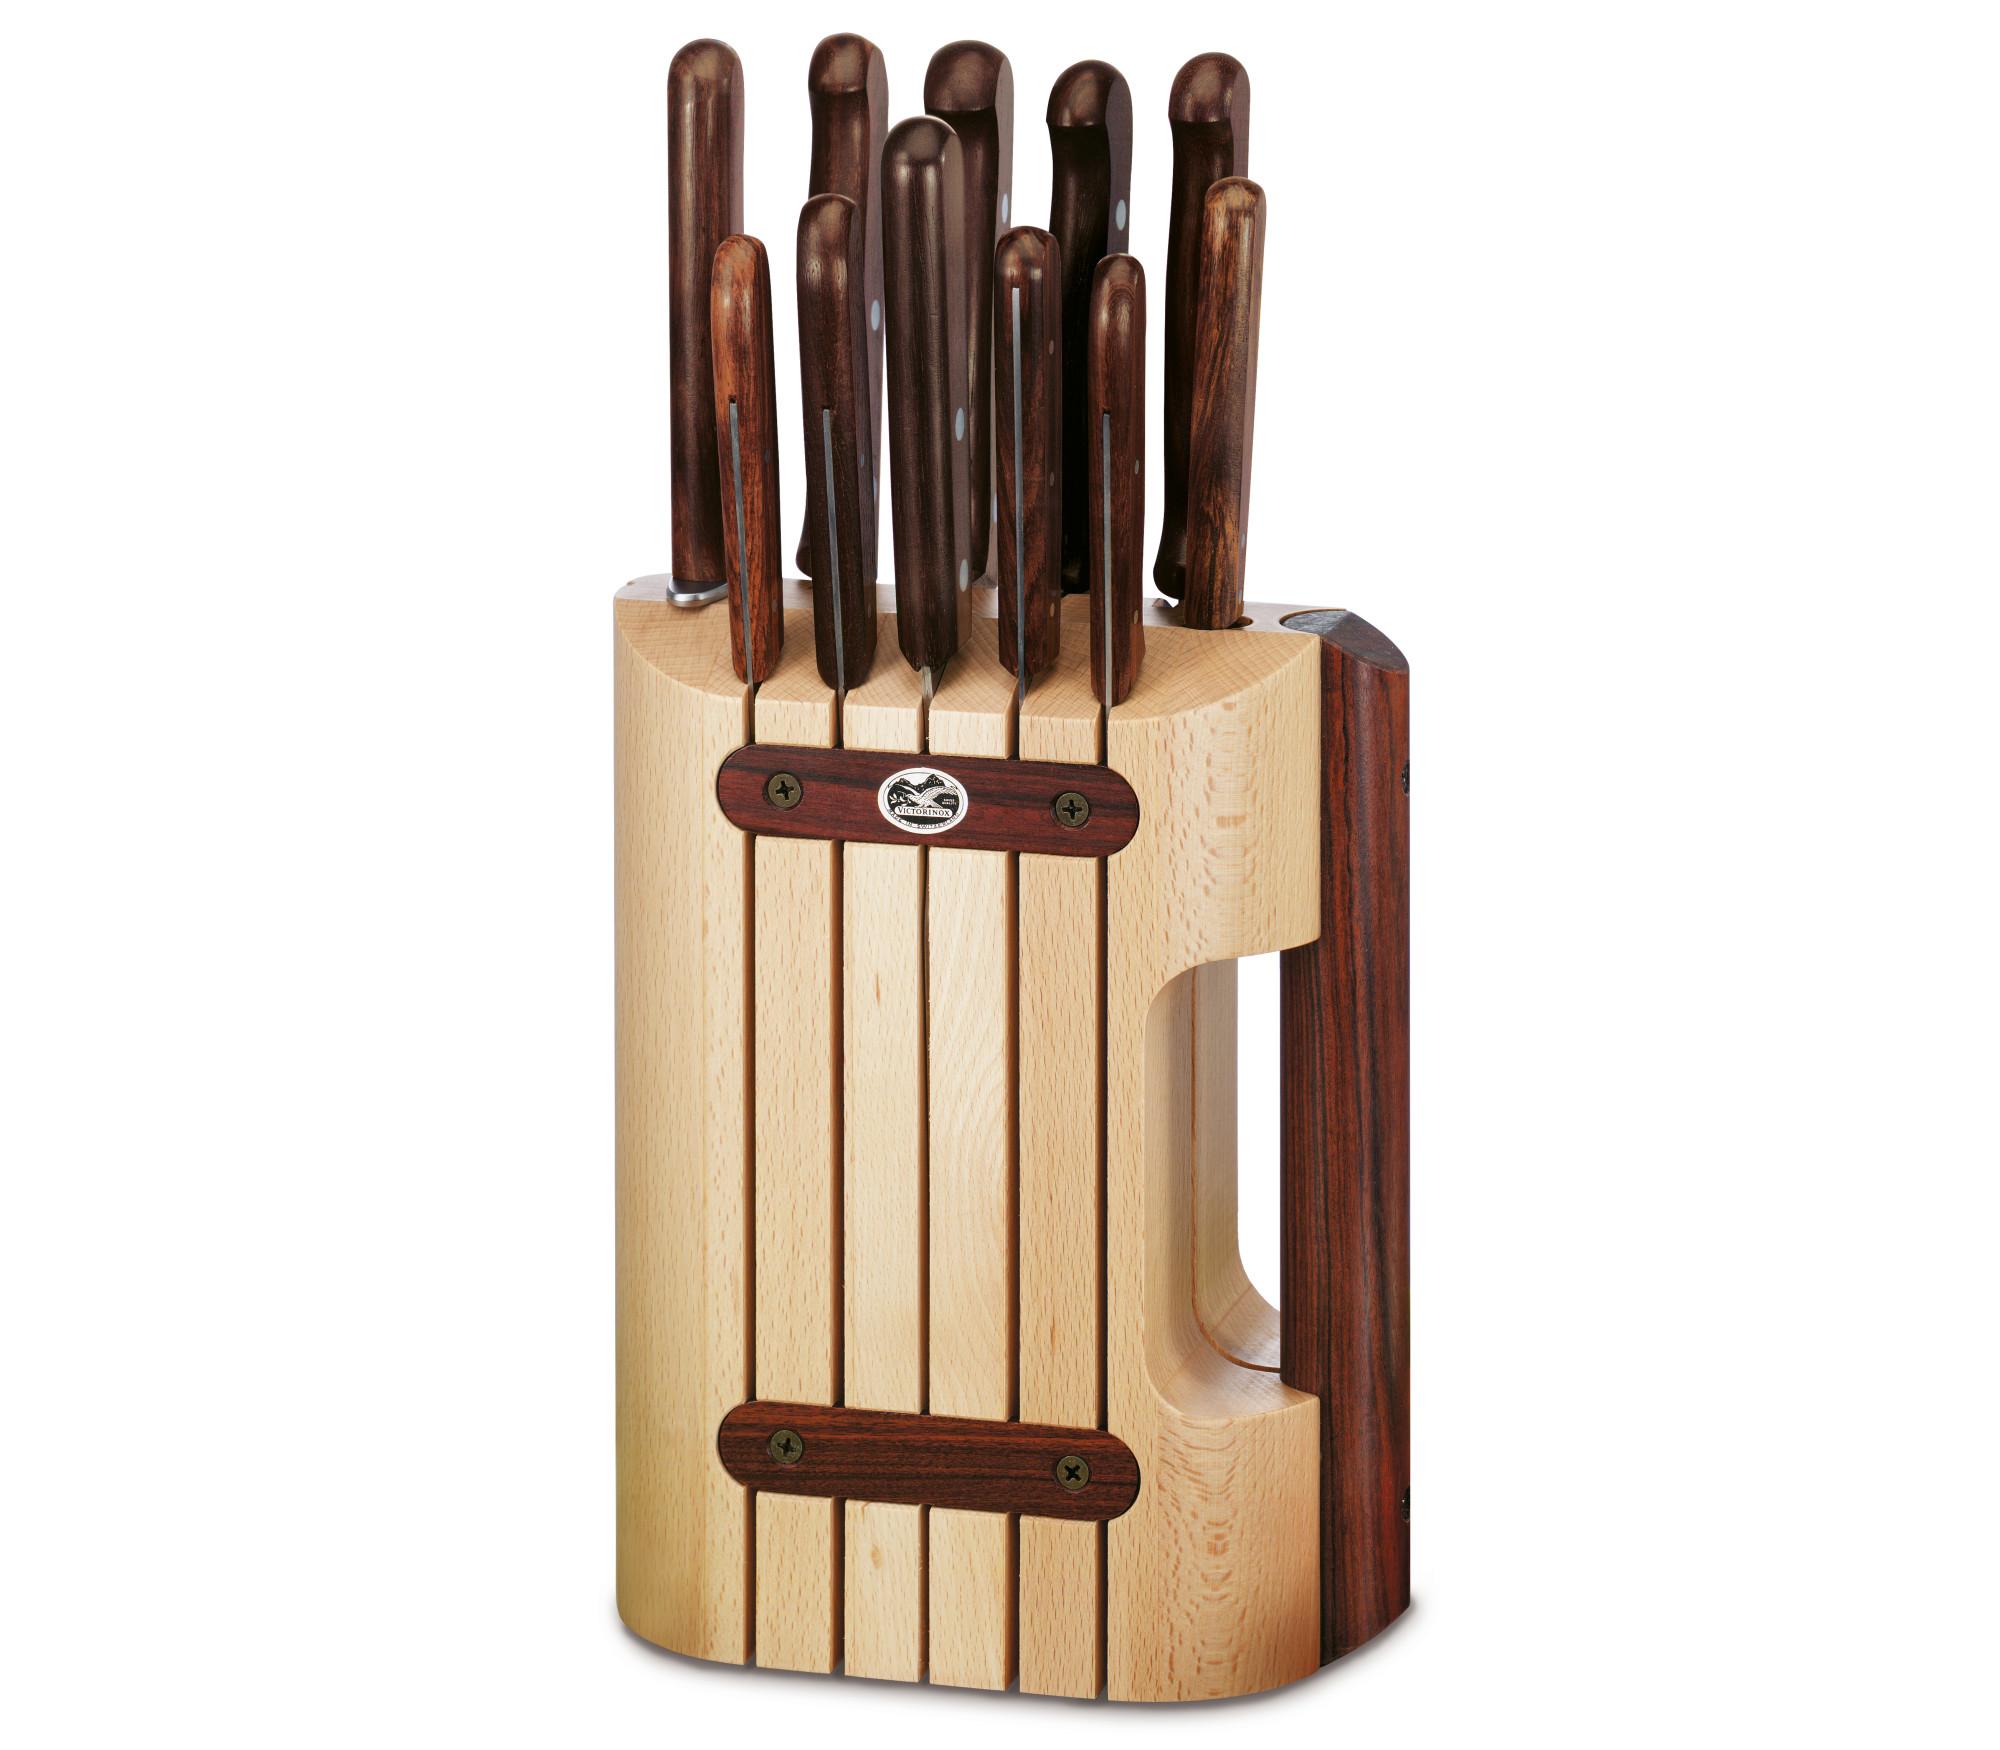 Sada nožů s blokem 11 ks ROSEWOOD dřevěná rukojeť - Victorinox